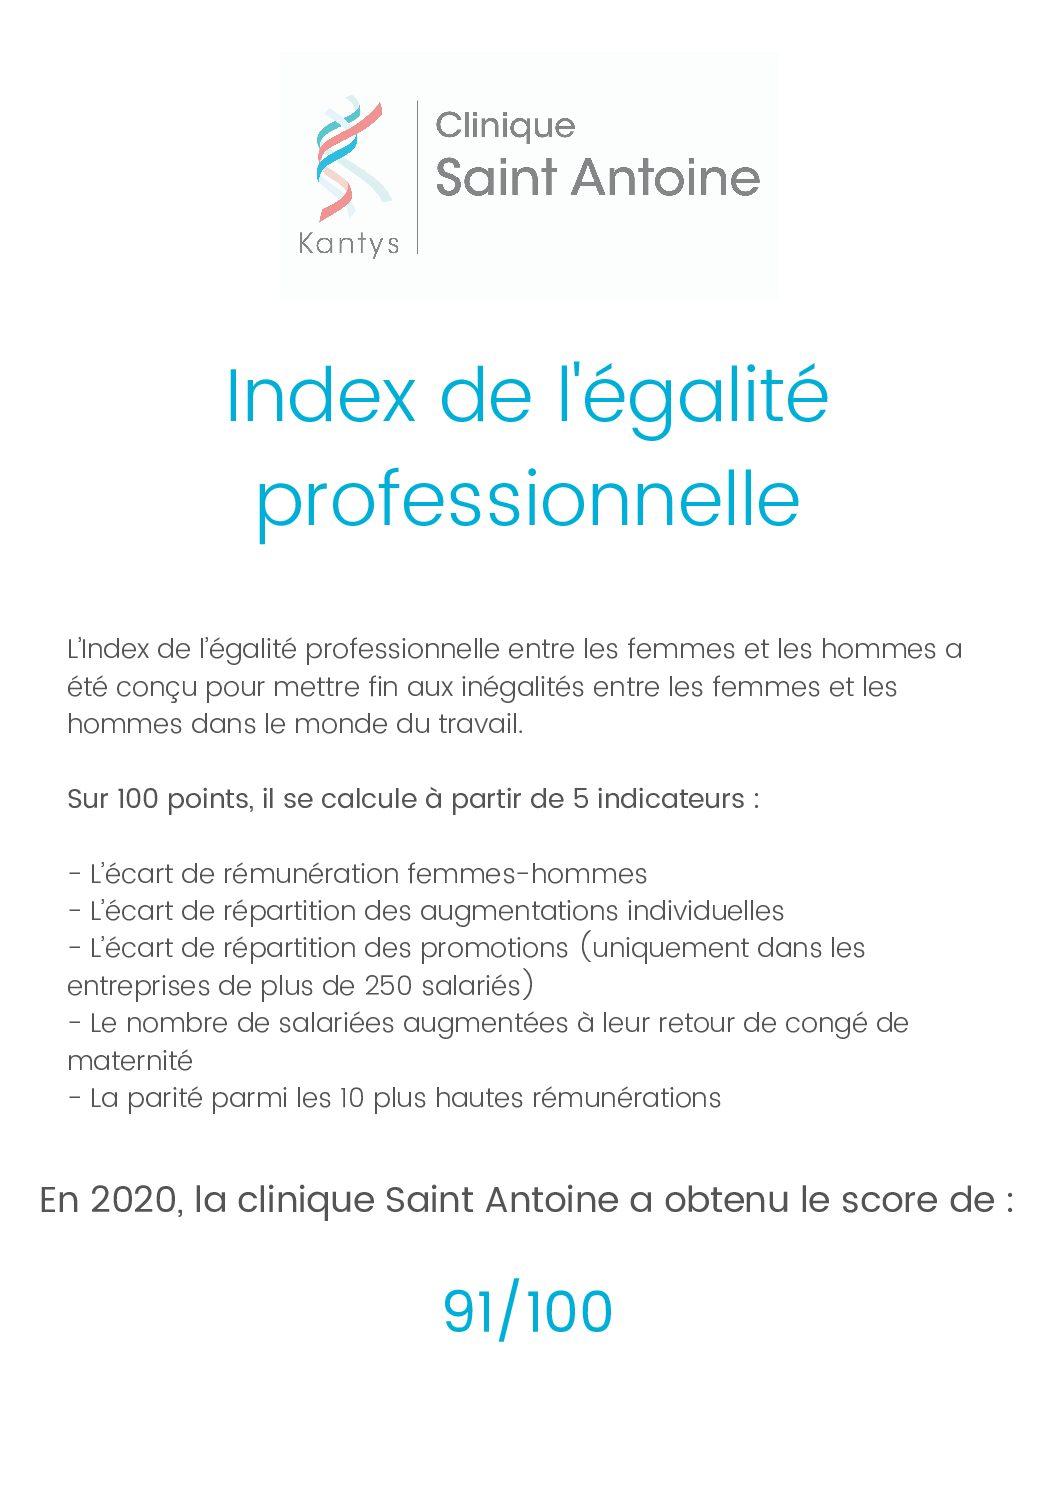 index-egalite-hommefemme_saint-antoine_2020